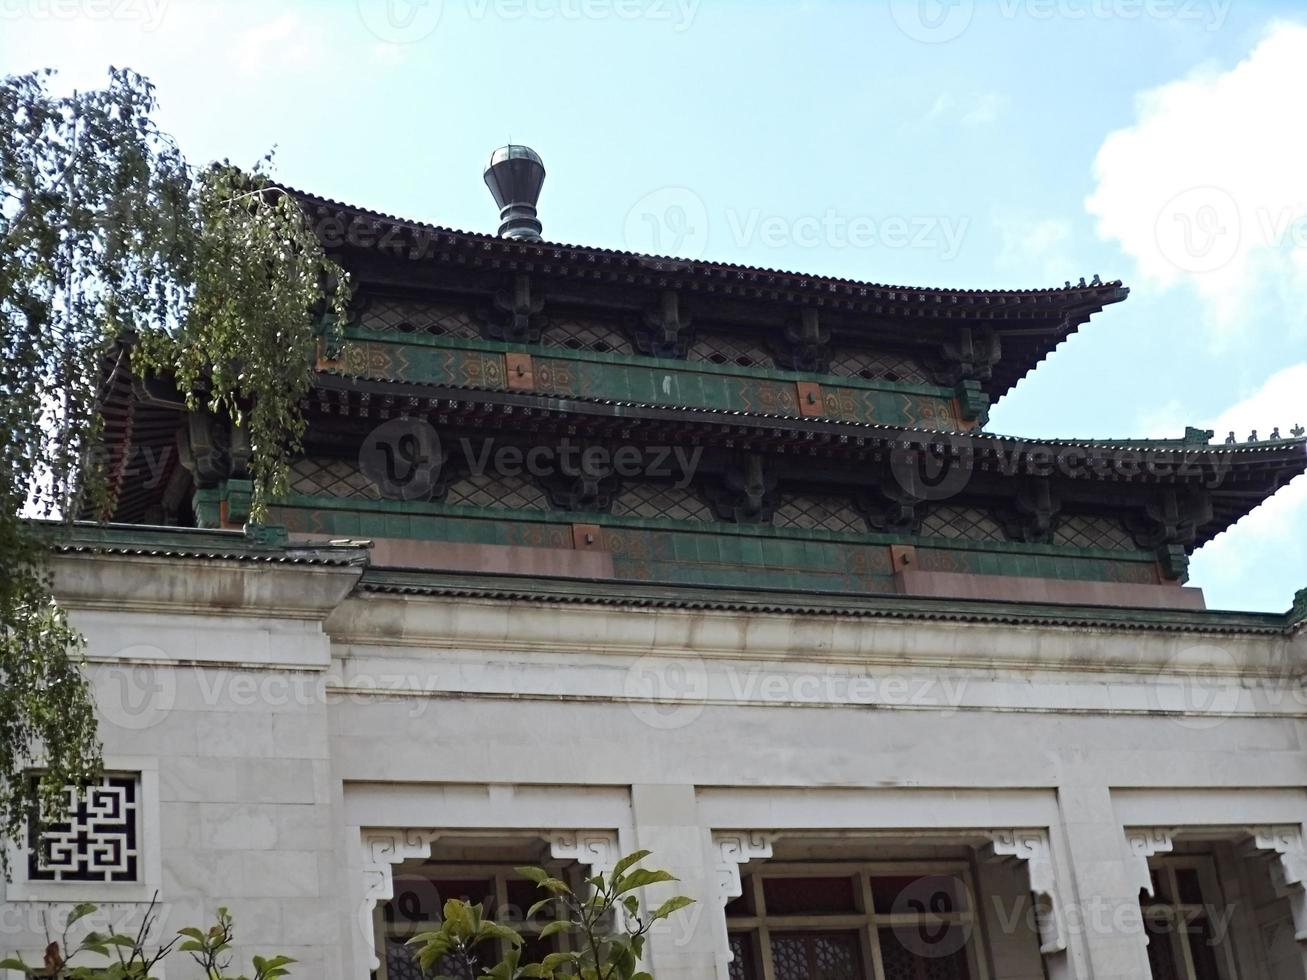 takdetalj i kinesisk byggnad foto